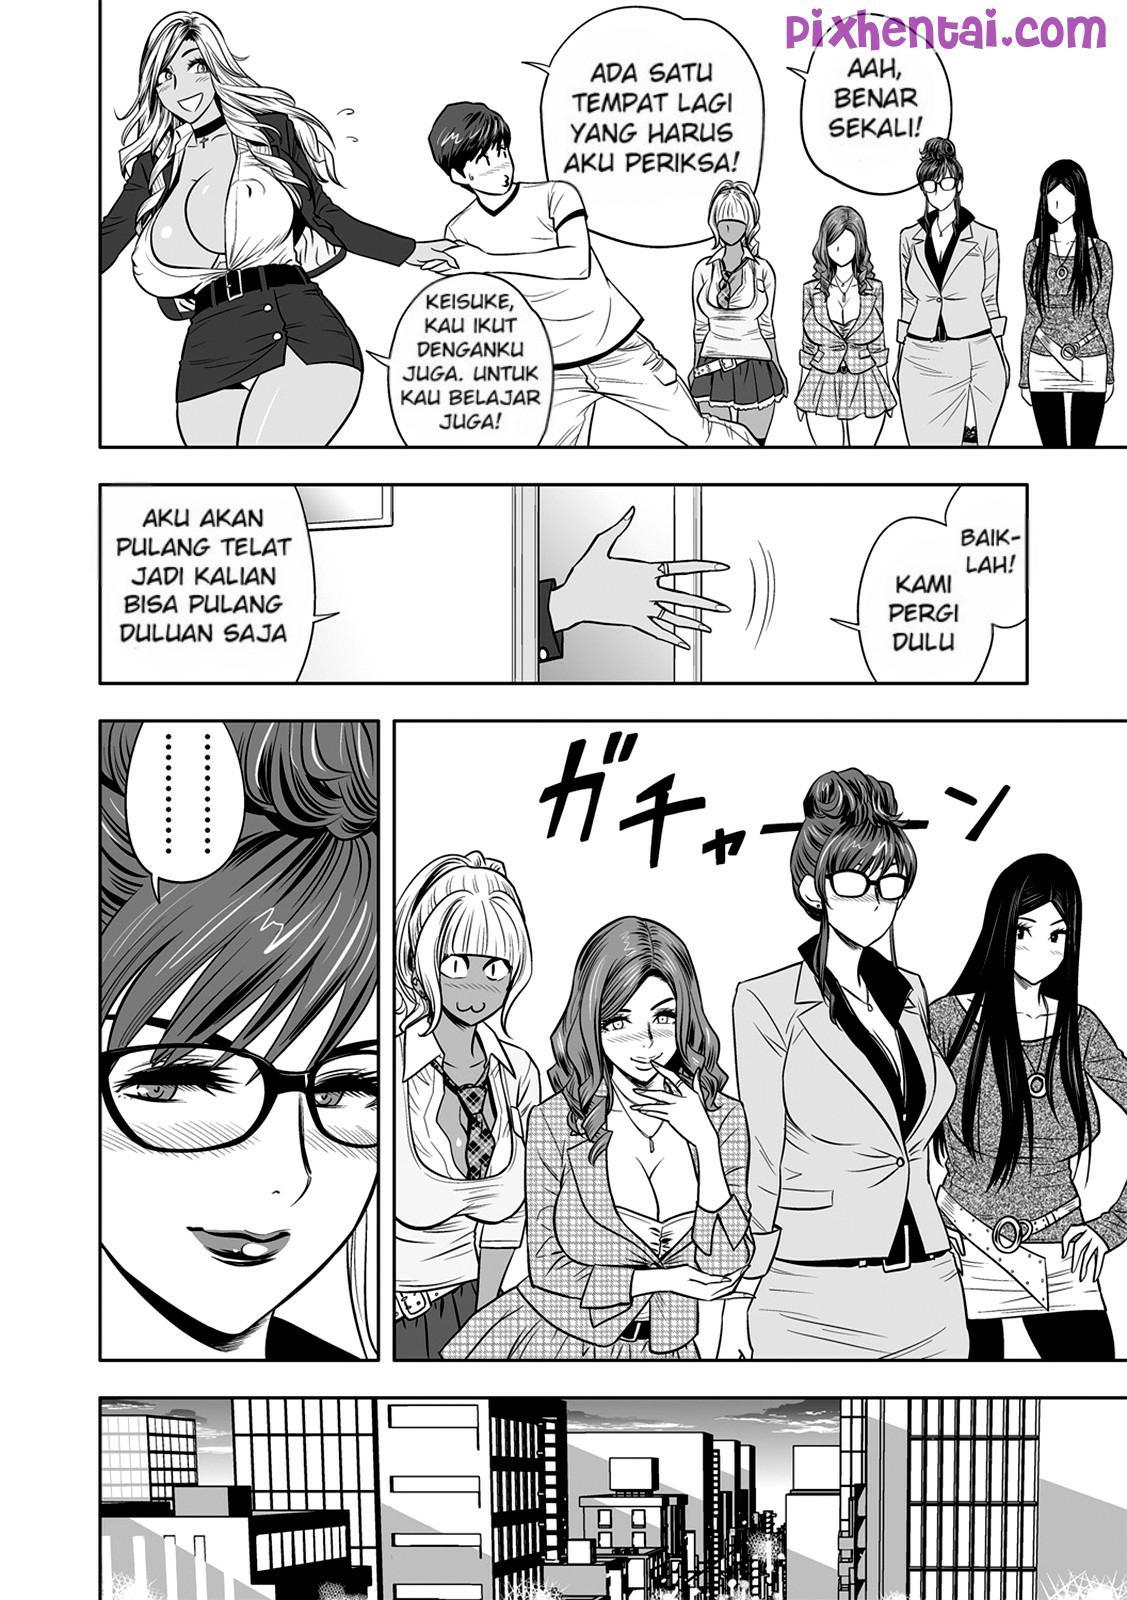 Komik Hentai Diajak Ngesex Direktur Montok Manga XXX Porn Doujin Sex Bokep 15